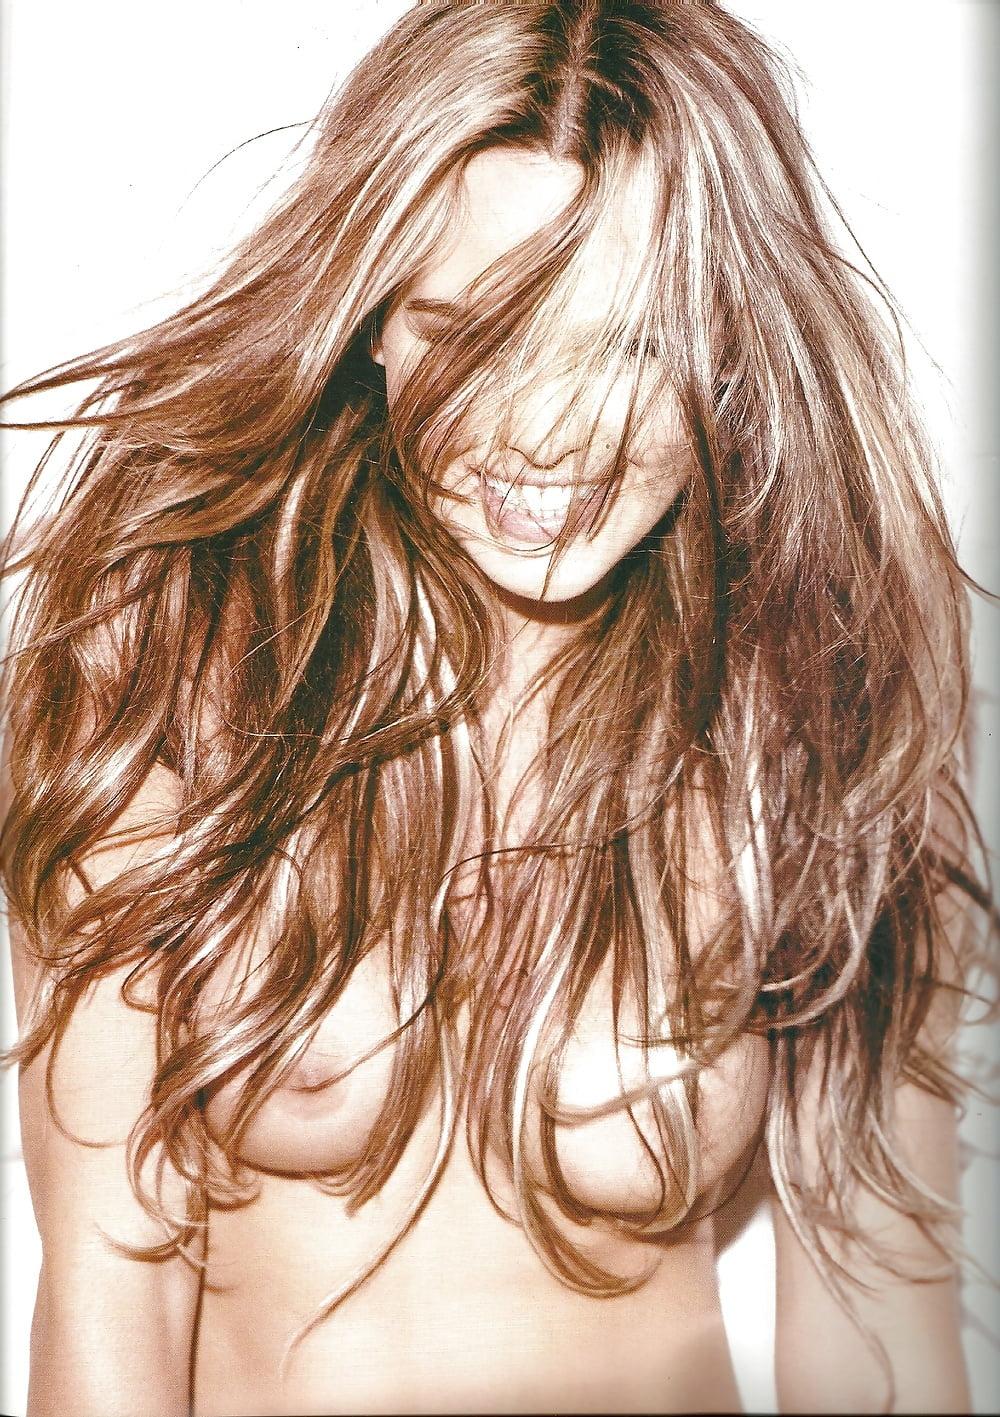 Michelle Baker Wild Amaginations